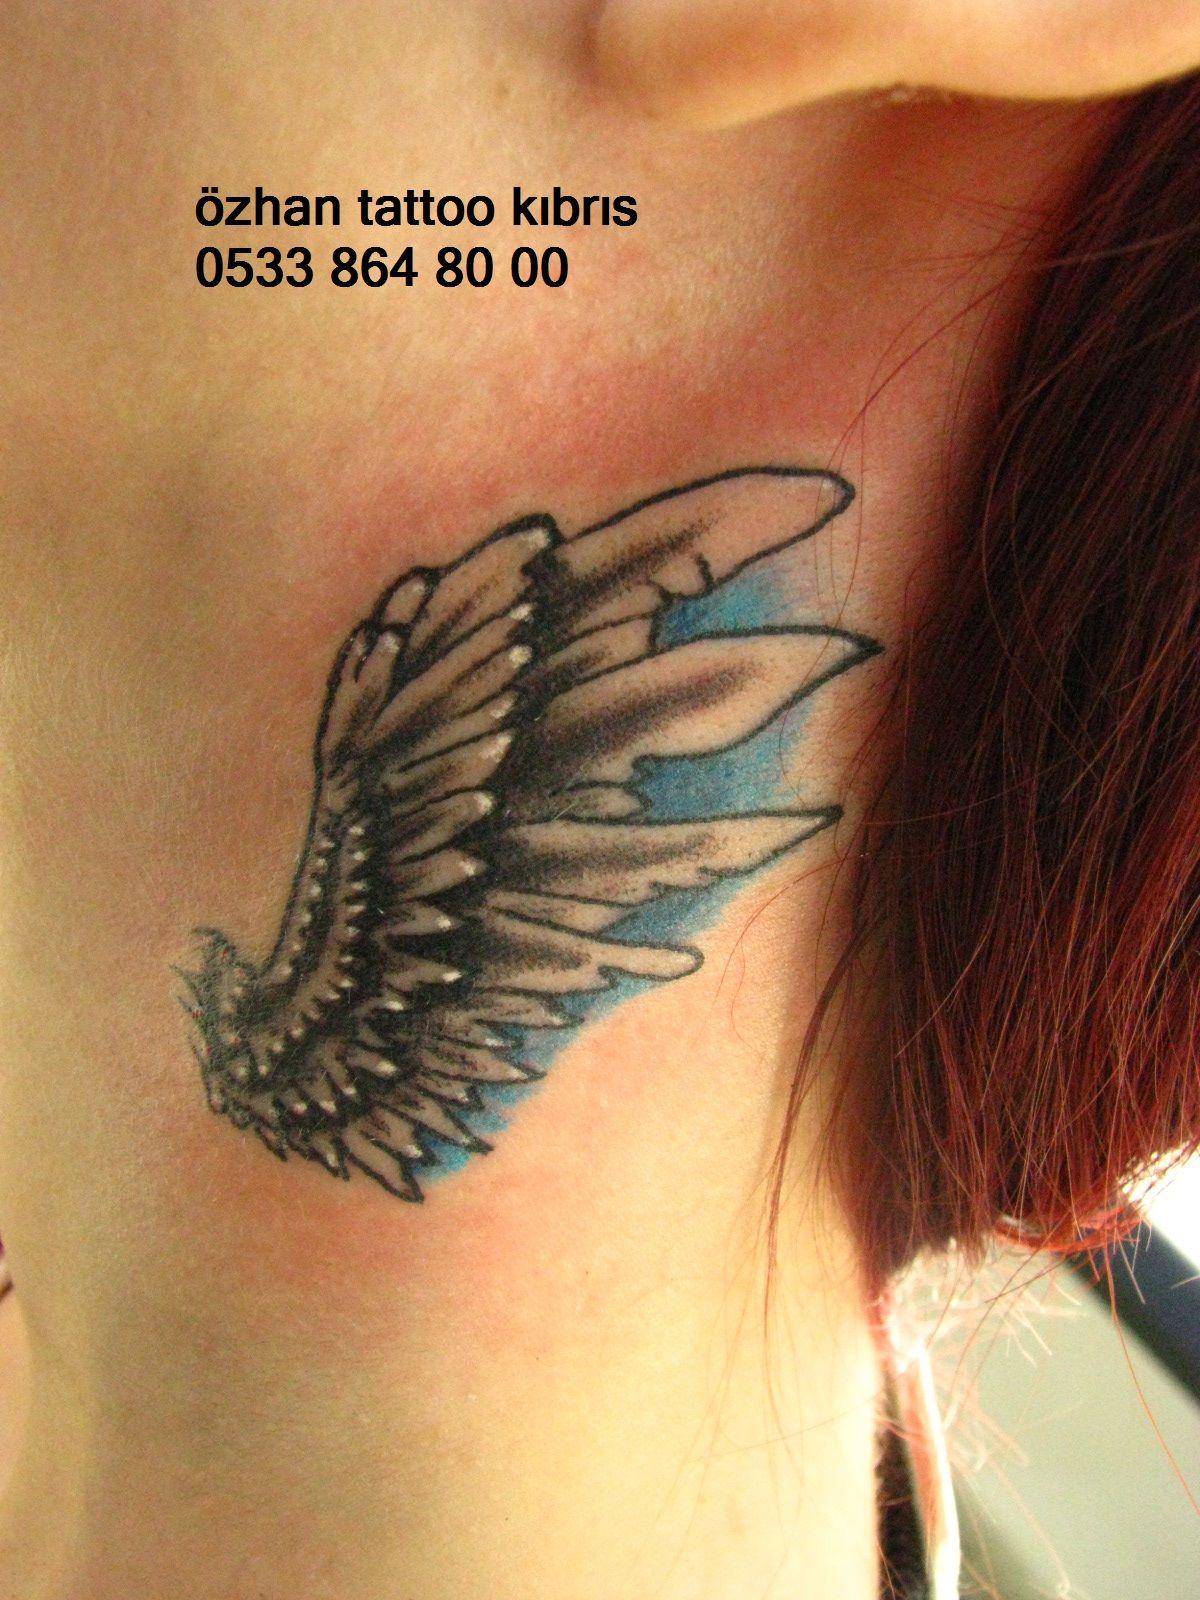 Dovmeciler Dovme Fiyati Dovme Fiyatlari Kktc Piercing Cyprus Tattoo Girne Dovme Magosa Dovme Guzelyurt Dovme Nicosia Tattoo T Tattoos Tattoo Prices Ear Tattoo